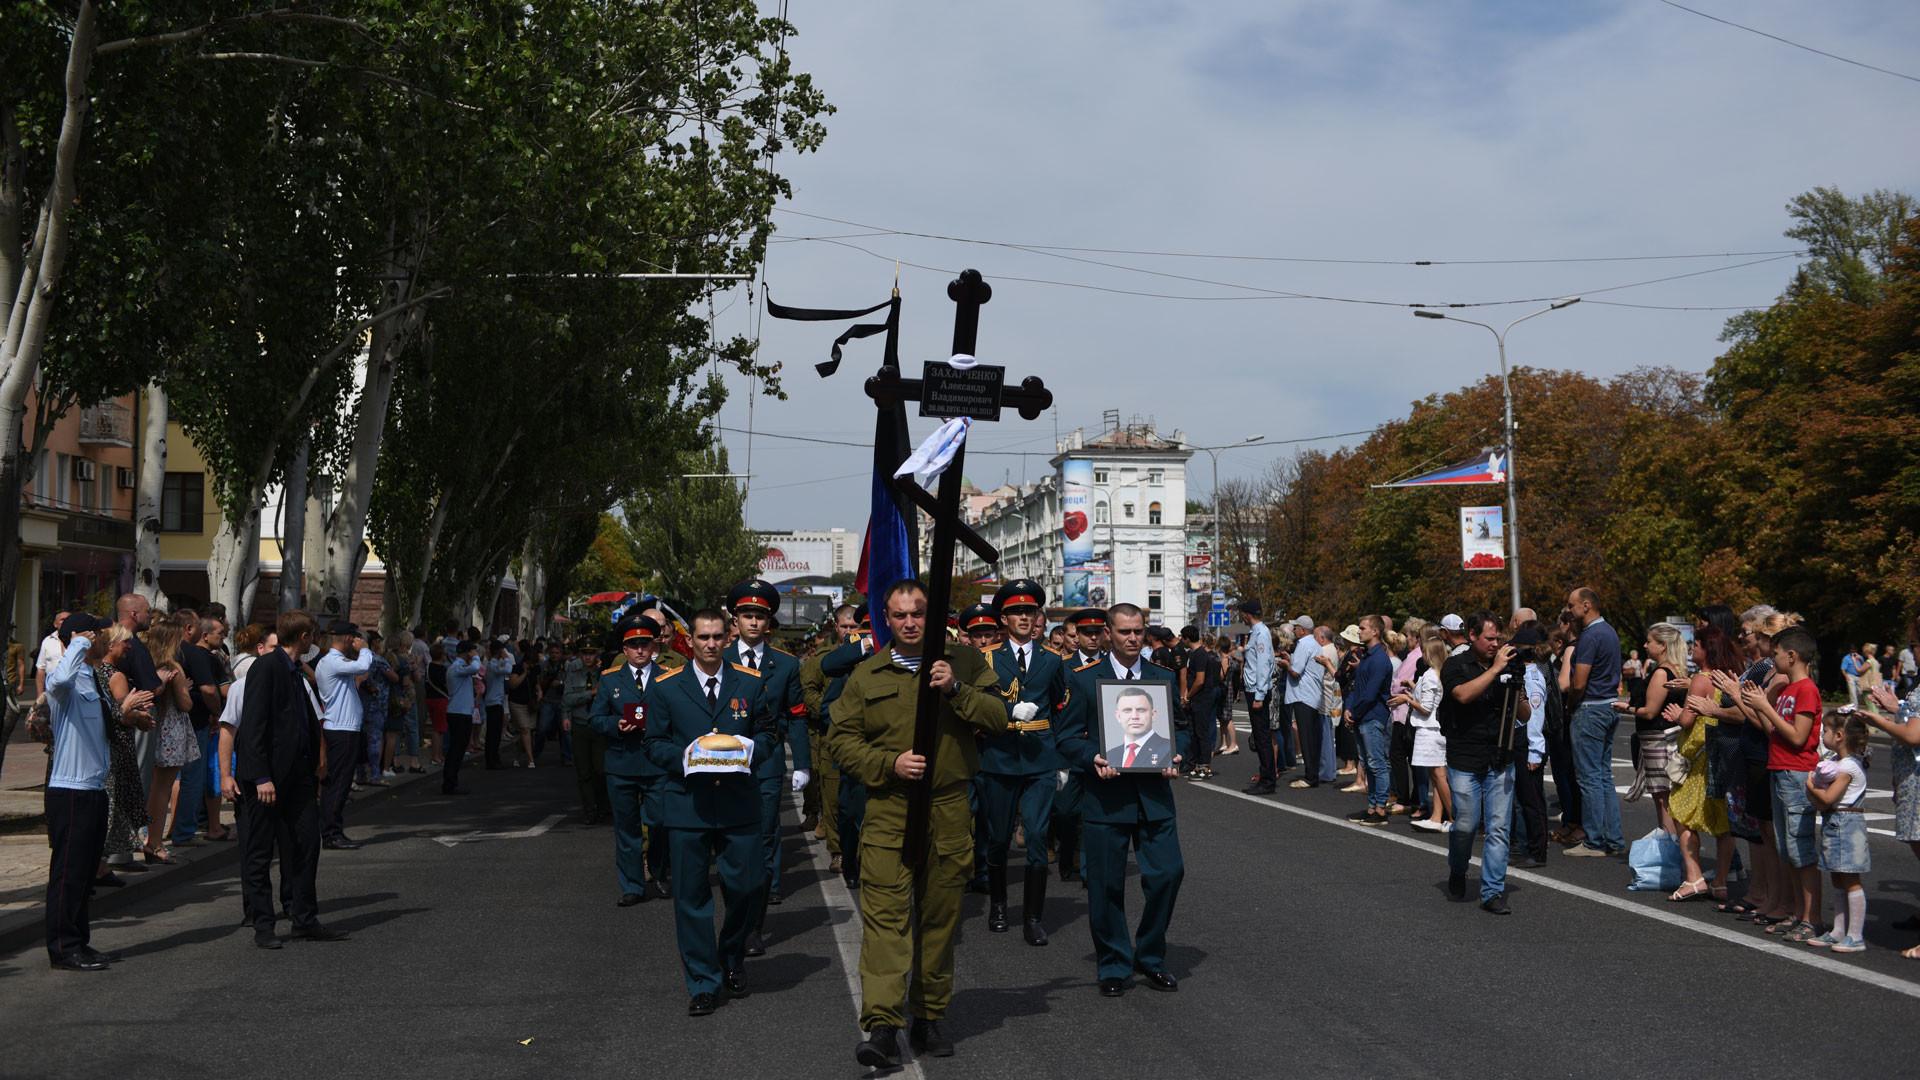 <p>Фото: &copy;&nbsp;РИА Новости/Валерий Мельников</p> <p></p>